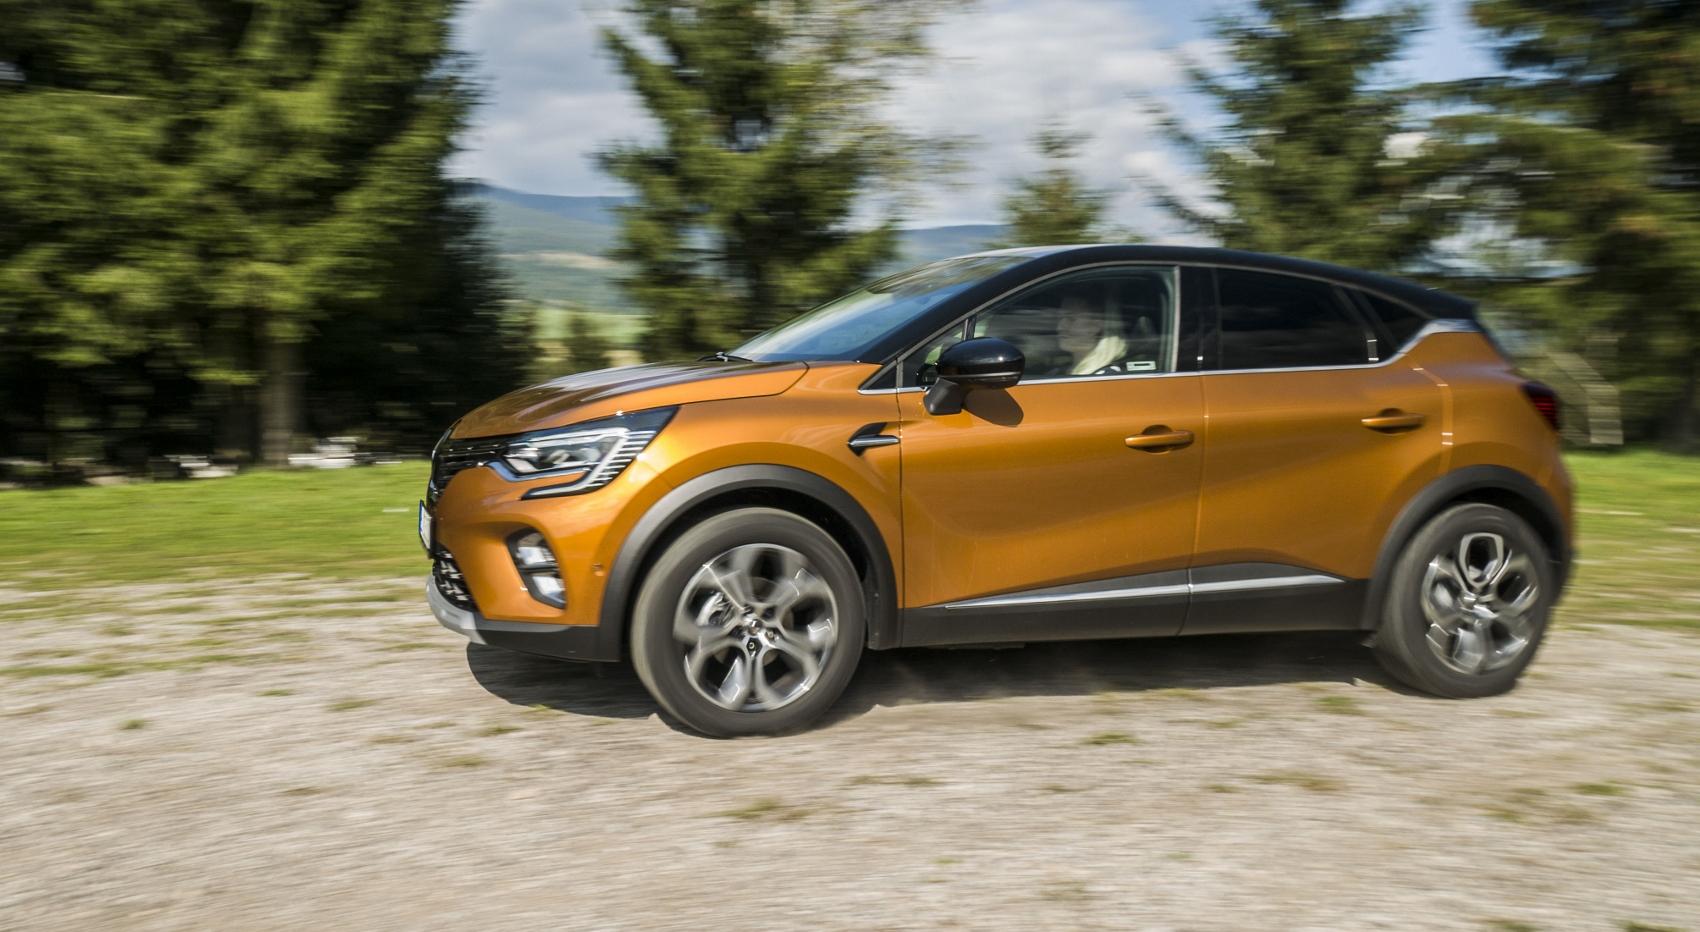 Test: V interiéri sa Renault Captur tvári ako o triedu drahšie auto jxmaLDkfel renault-captur-18